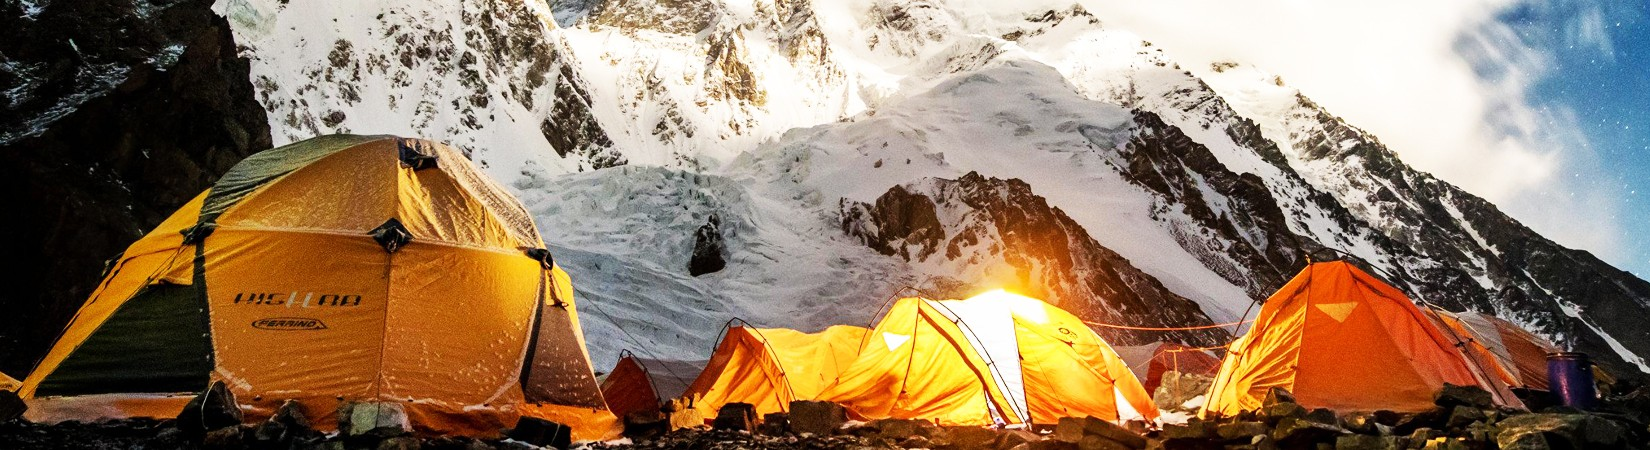 Base Camp of K2